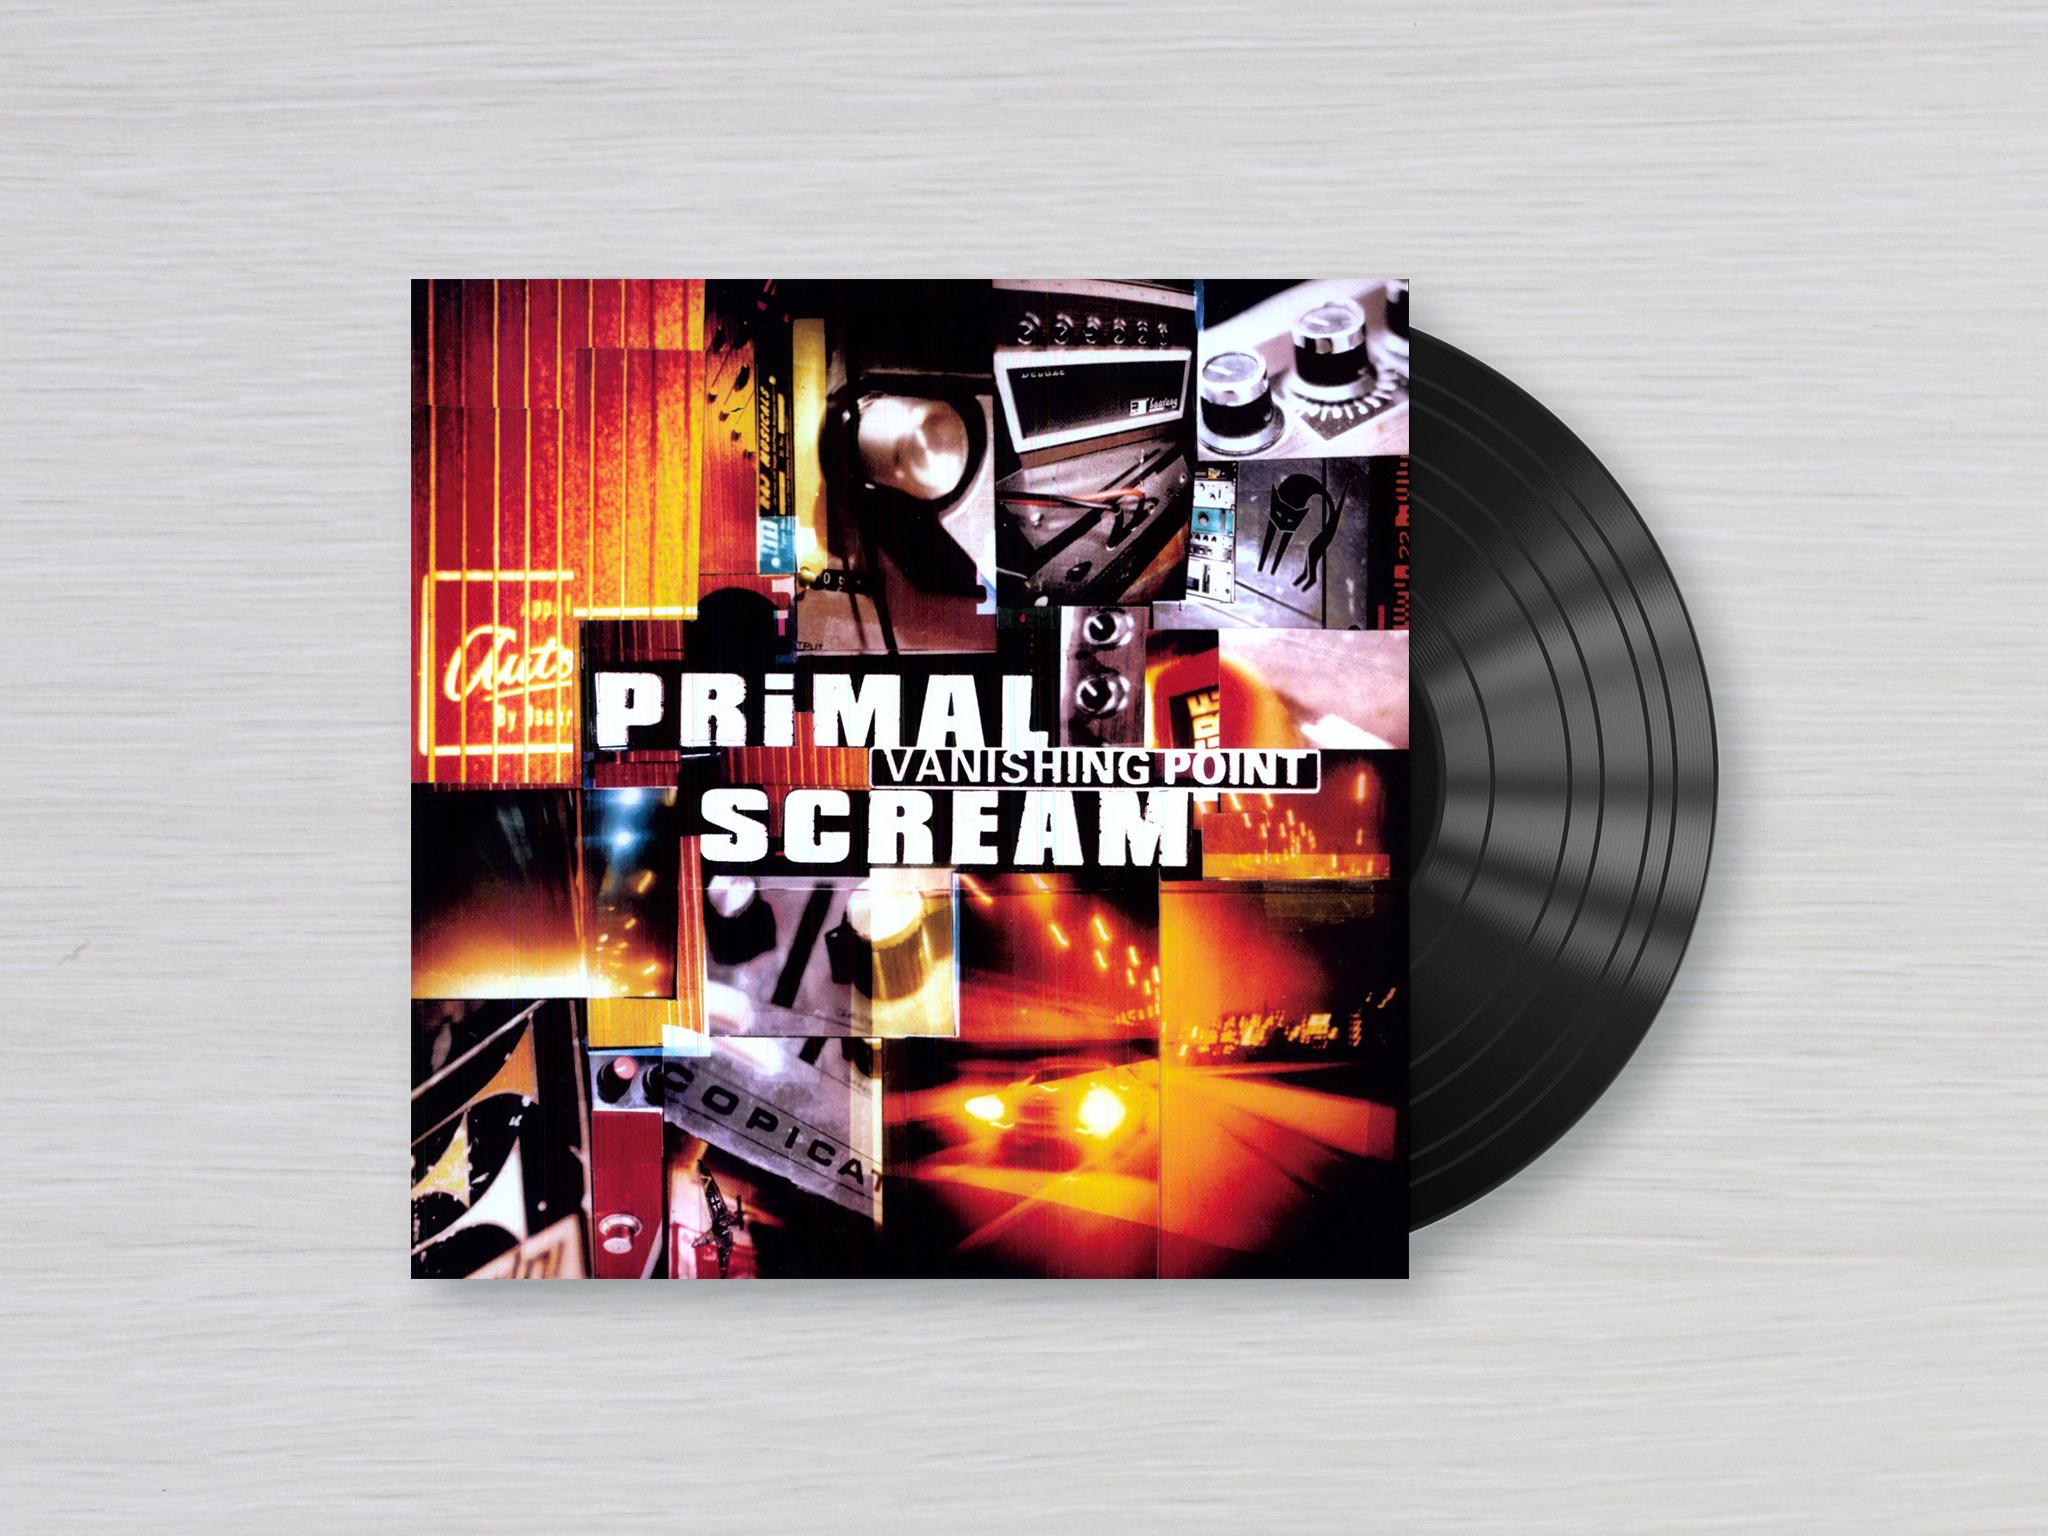 Vanishing Point – Primal Scream